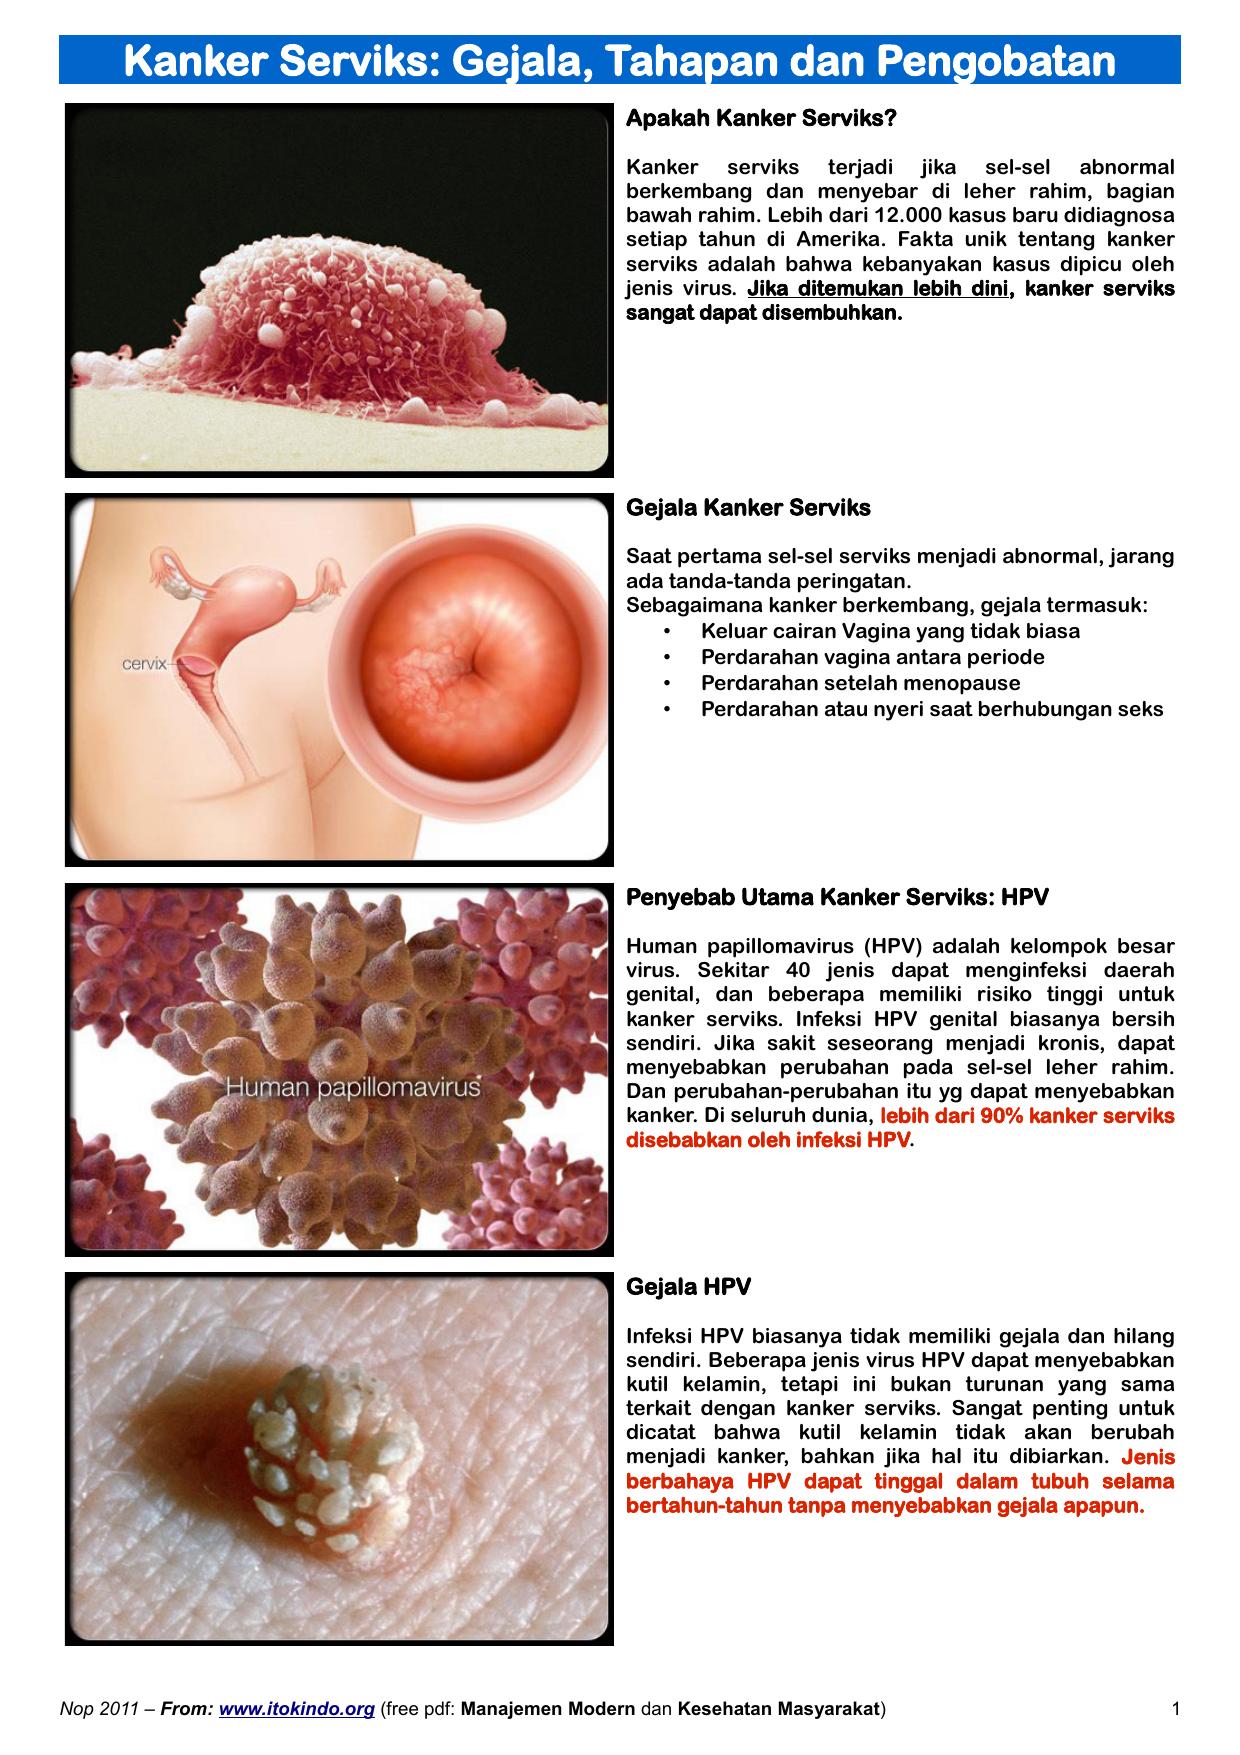 cancer de sange cauze mode transmission papillomavirus humain